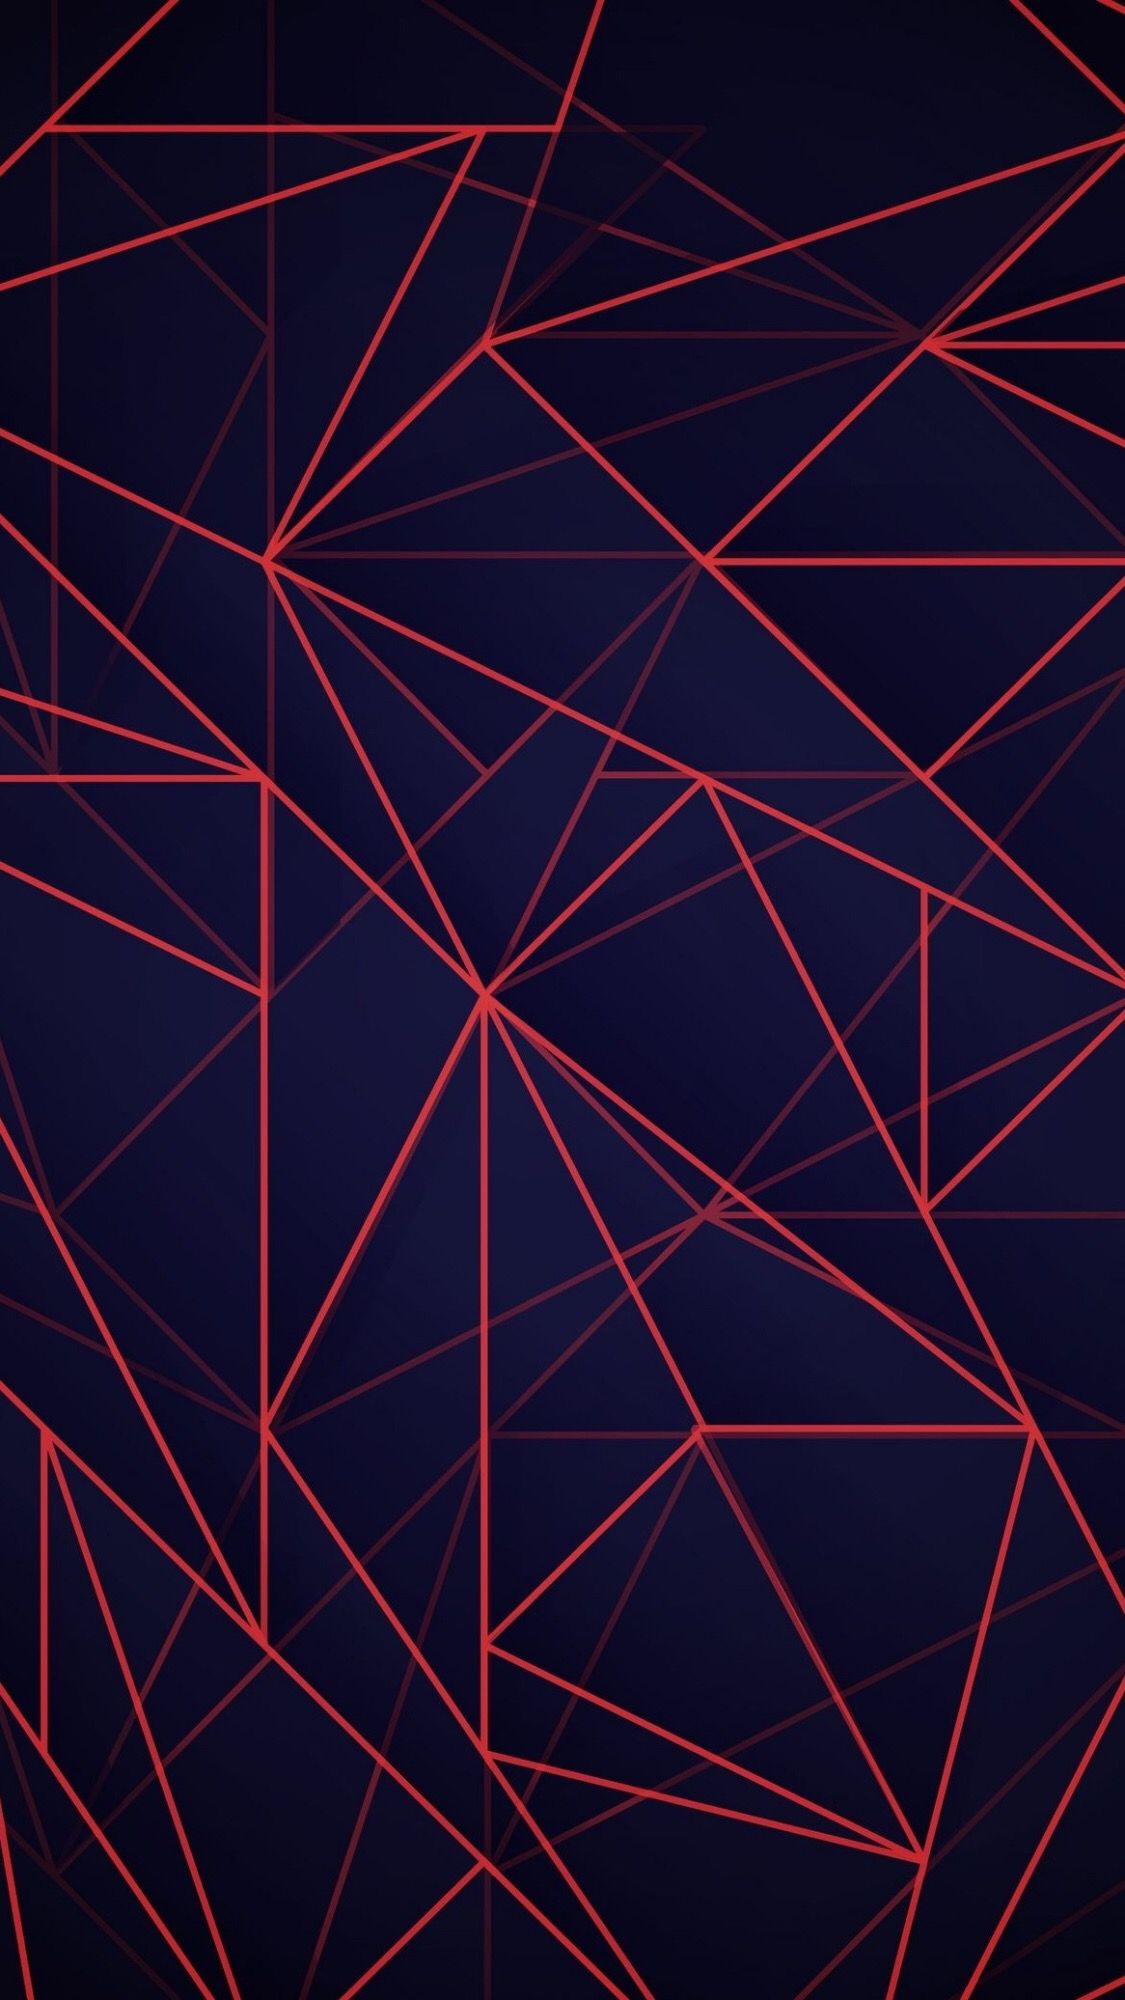 Red Line Wallpaper By Efforfake On Deviantart Android Wallpaper Pattern Wallpaper Abstract Wallpaper